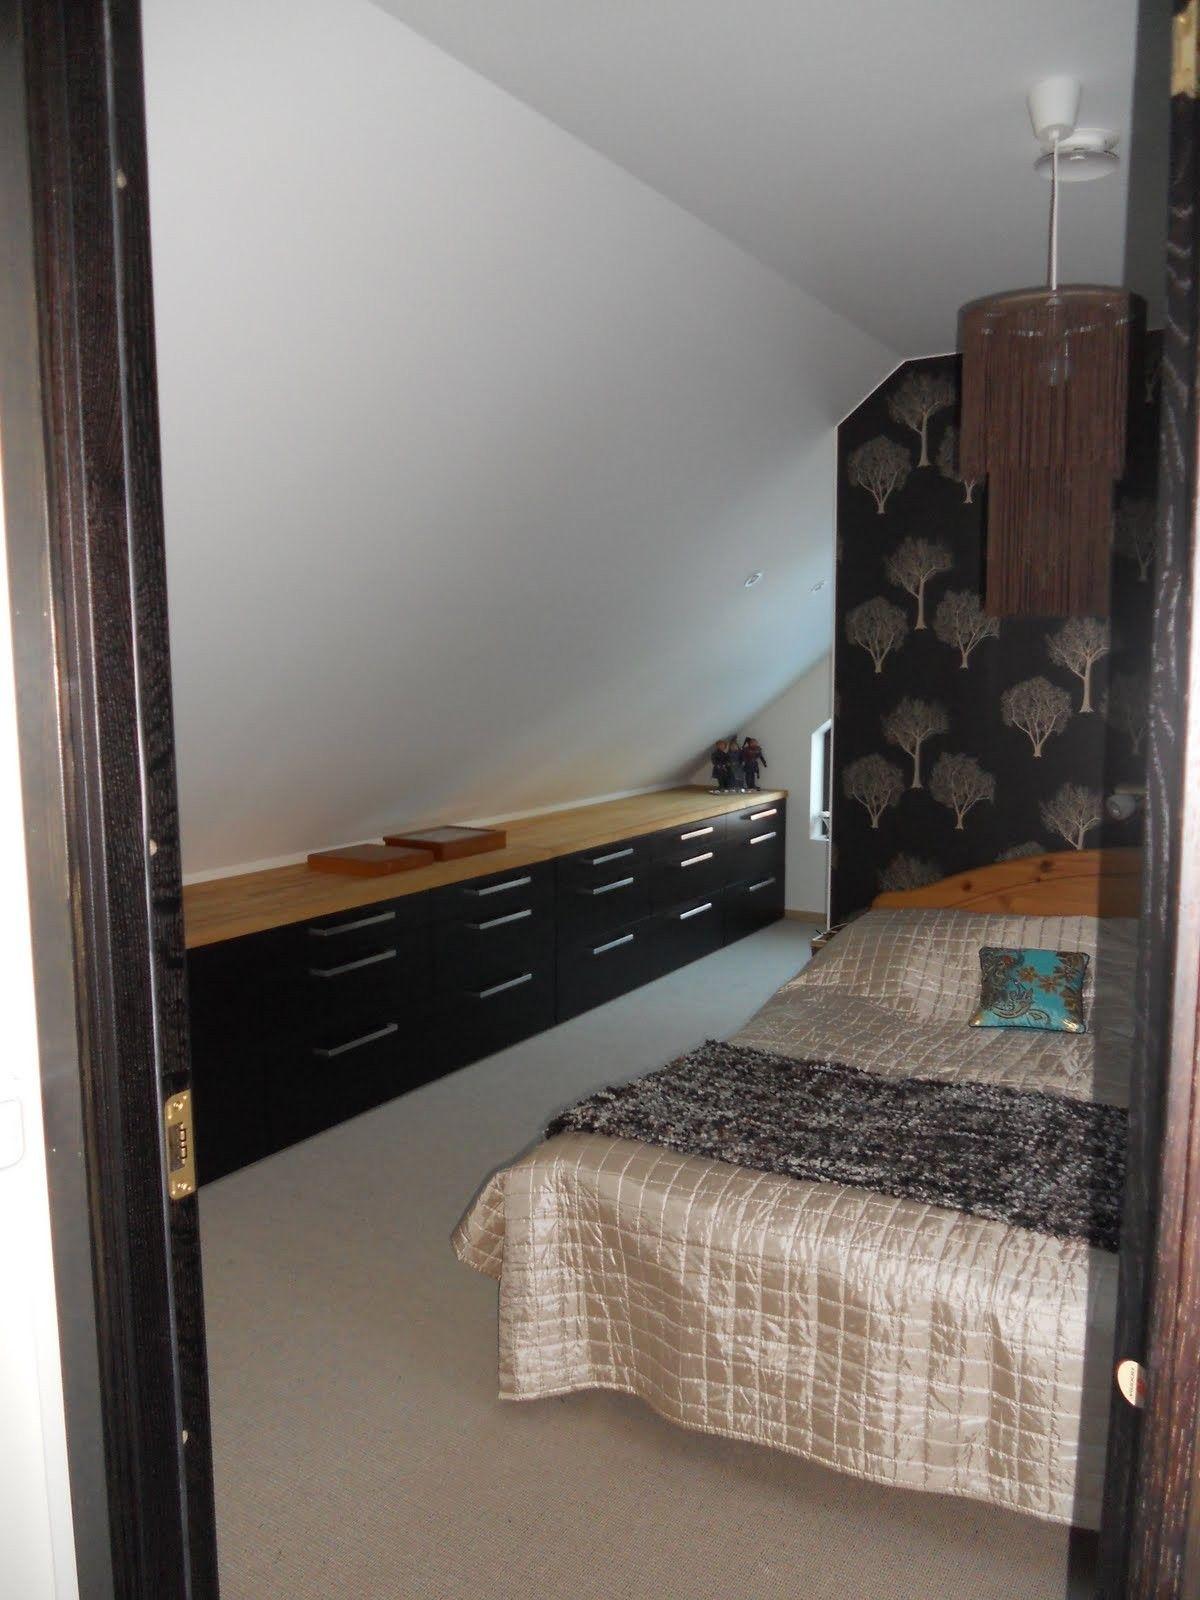 Pin By Lynda White Design On Ikea Diy Storage Bed Home Decor Tips Under Bed Storage